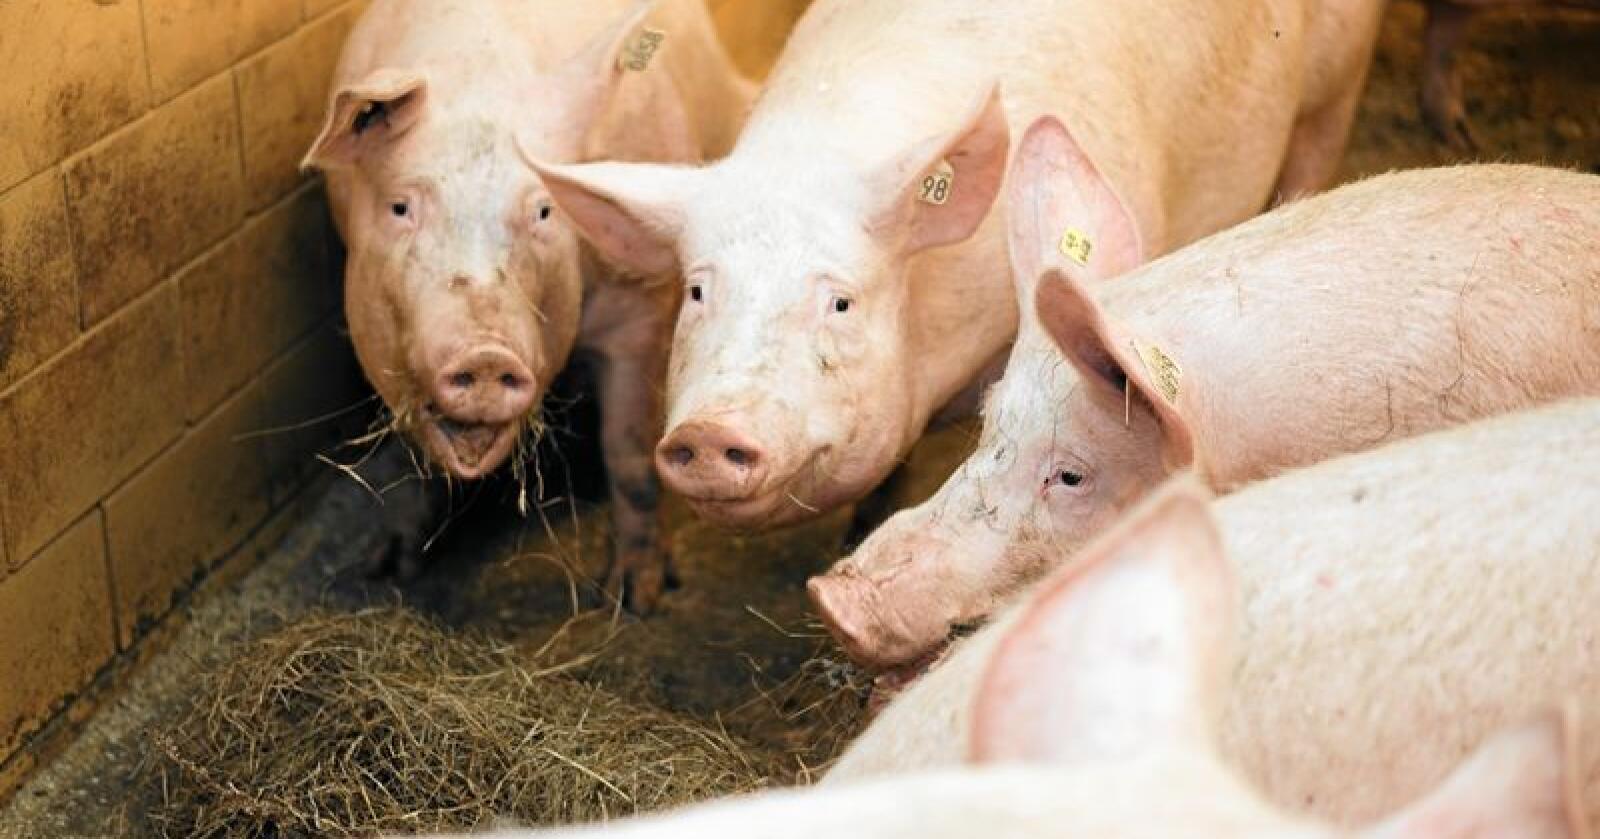 Danske svineeksportører møtes i byen Fredericia til krisemøte. Foto: Benjamin Hernes Vogl